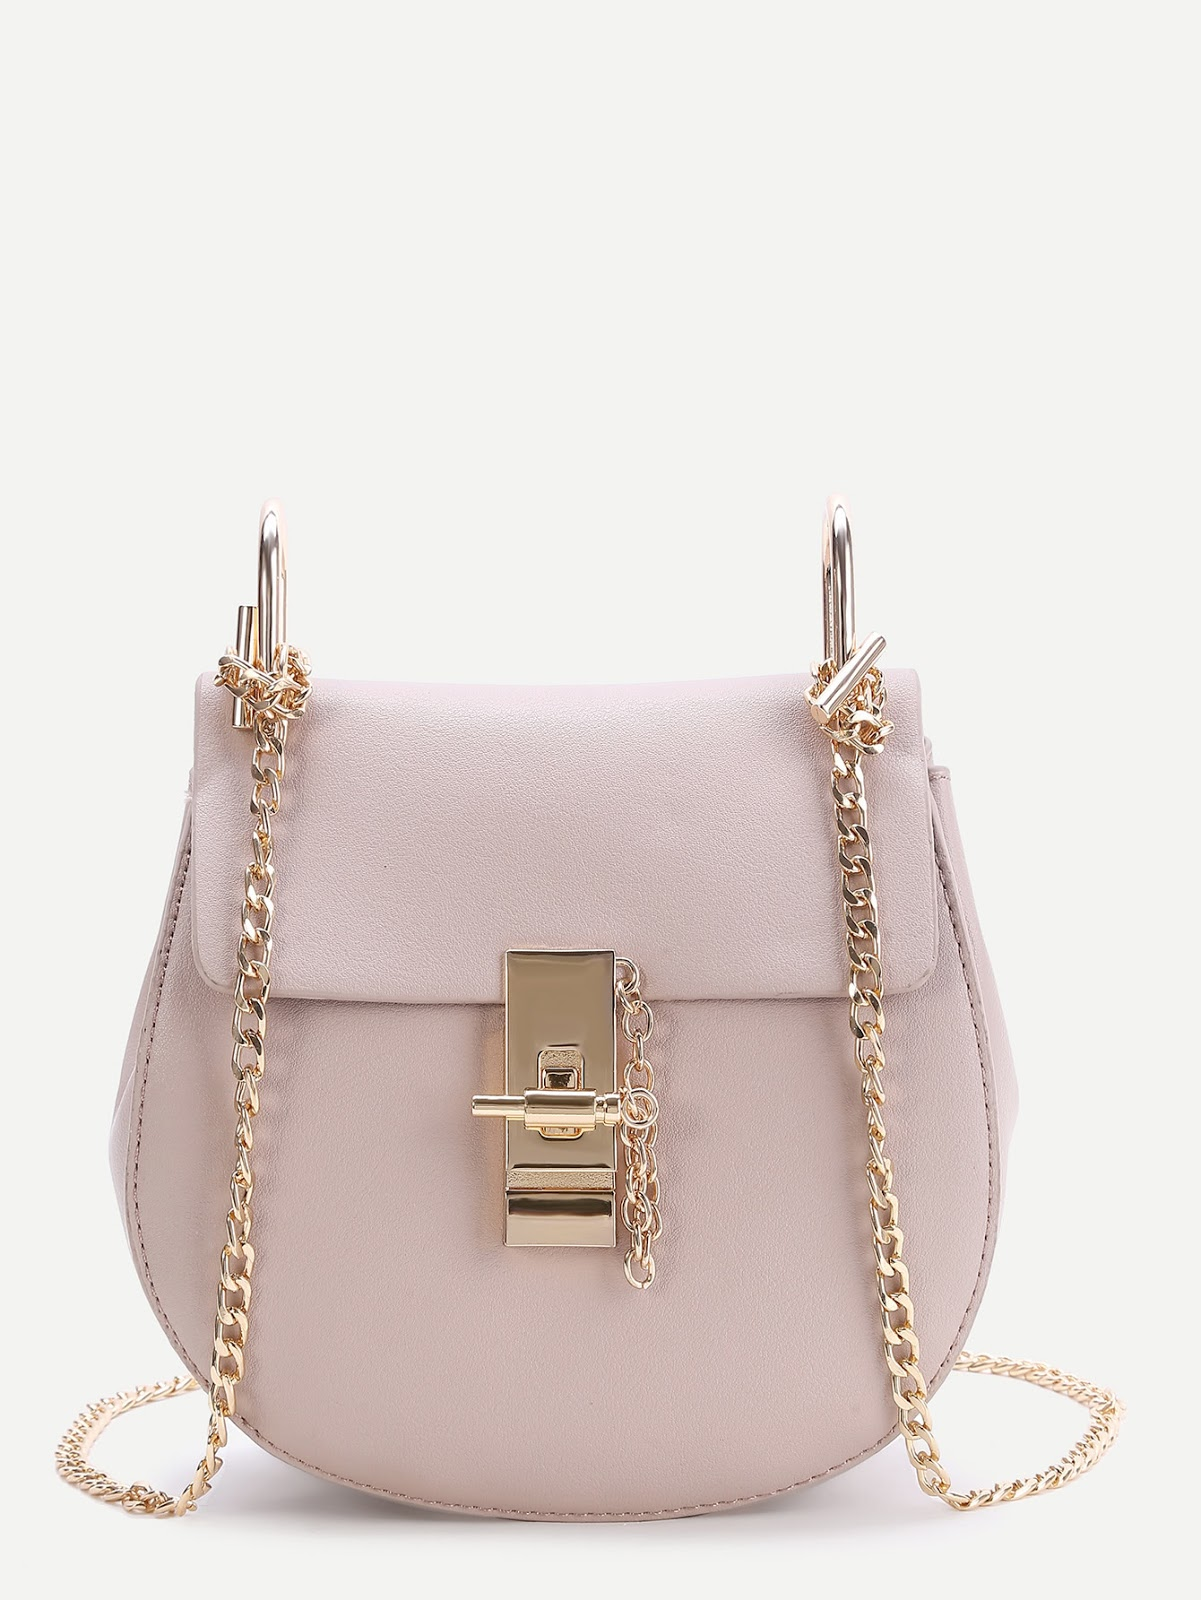 Designer Dupe Bags Wishlist Ingrid Hughes Beauty